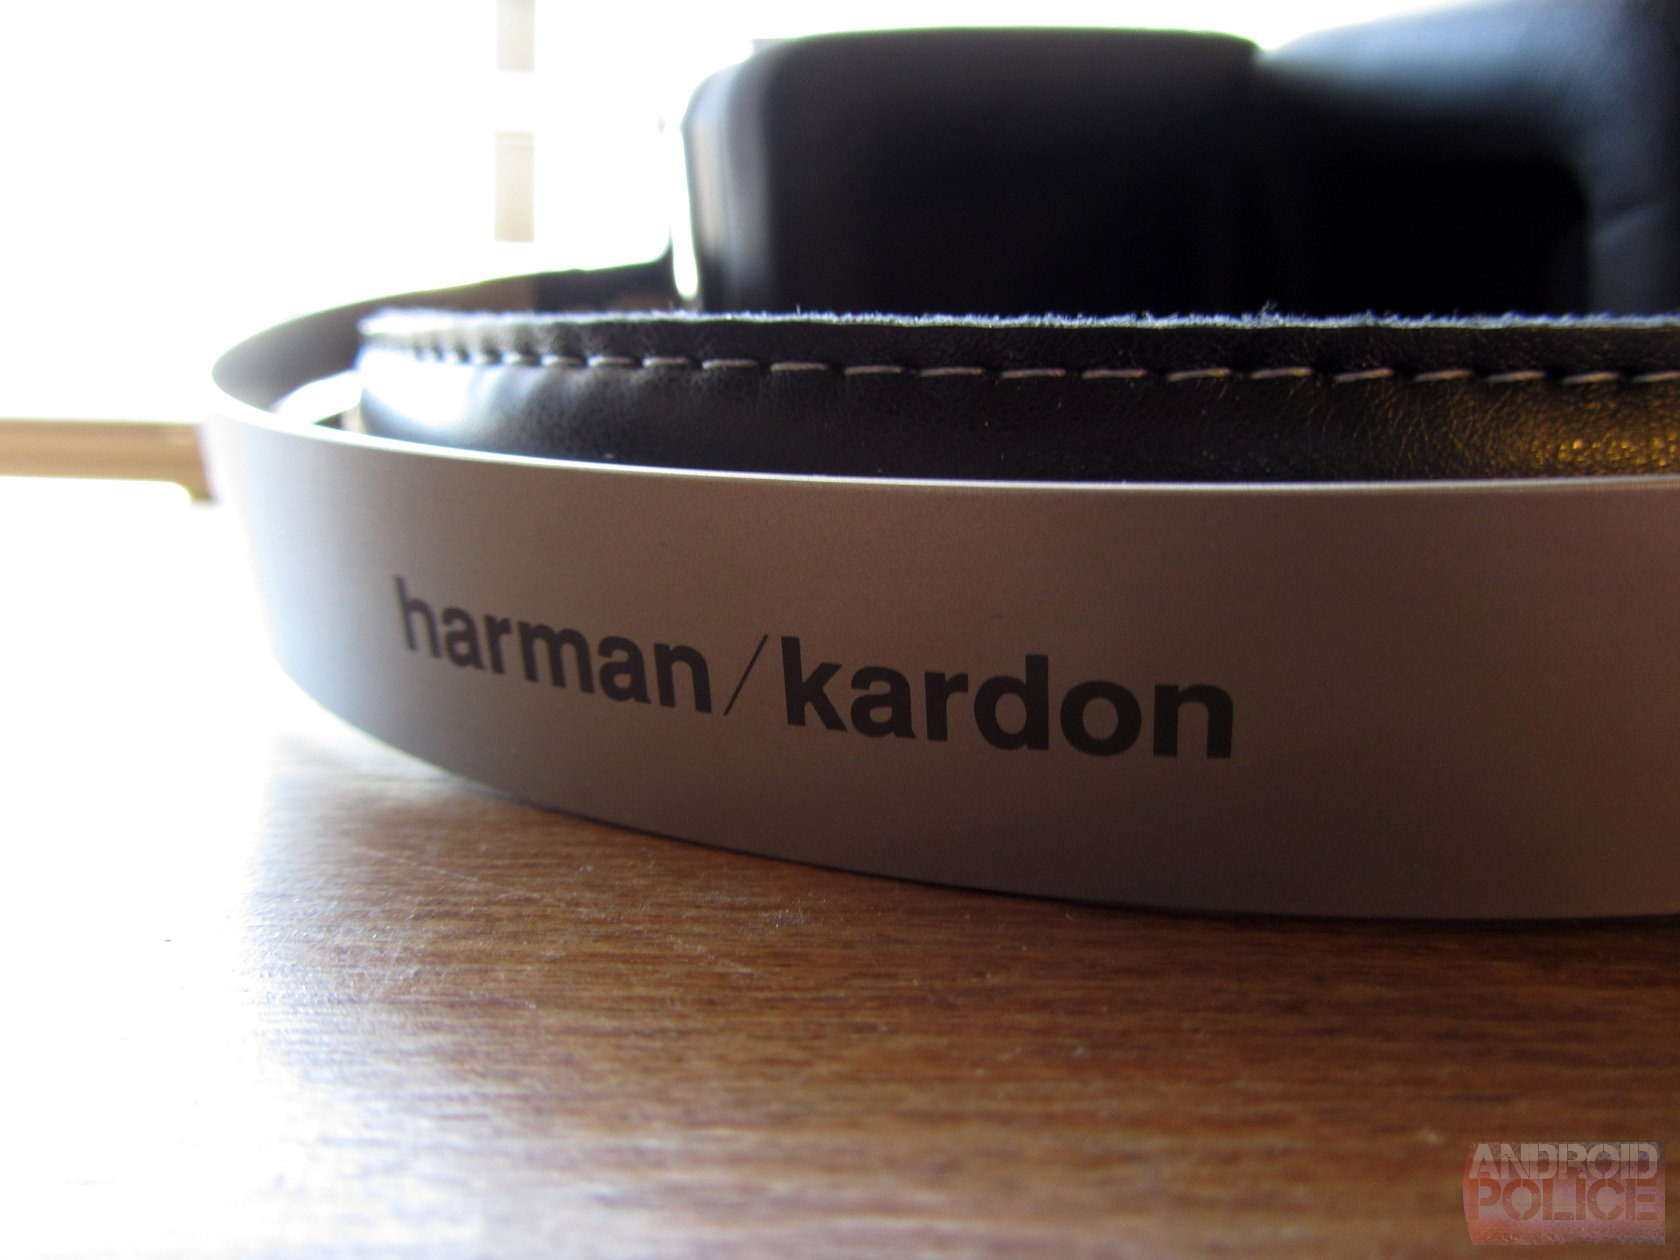 a9a71acf339 Quick Review] Harman Kardon BT Bluetooth Headphones